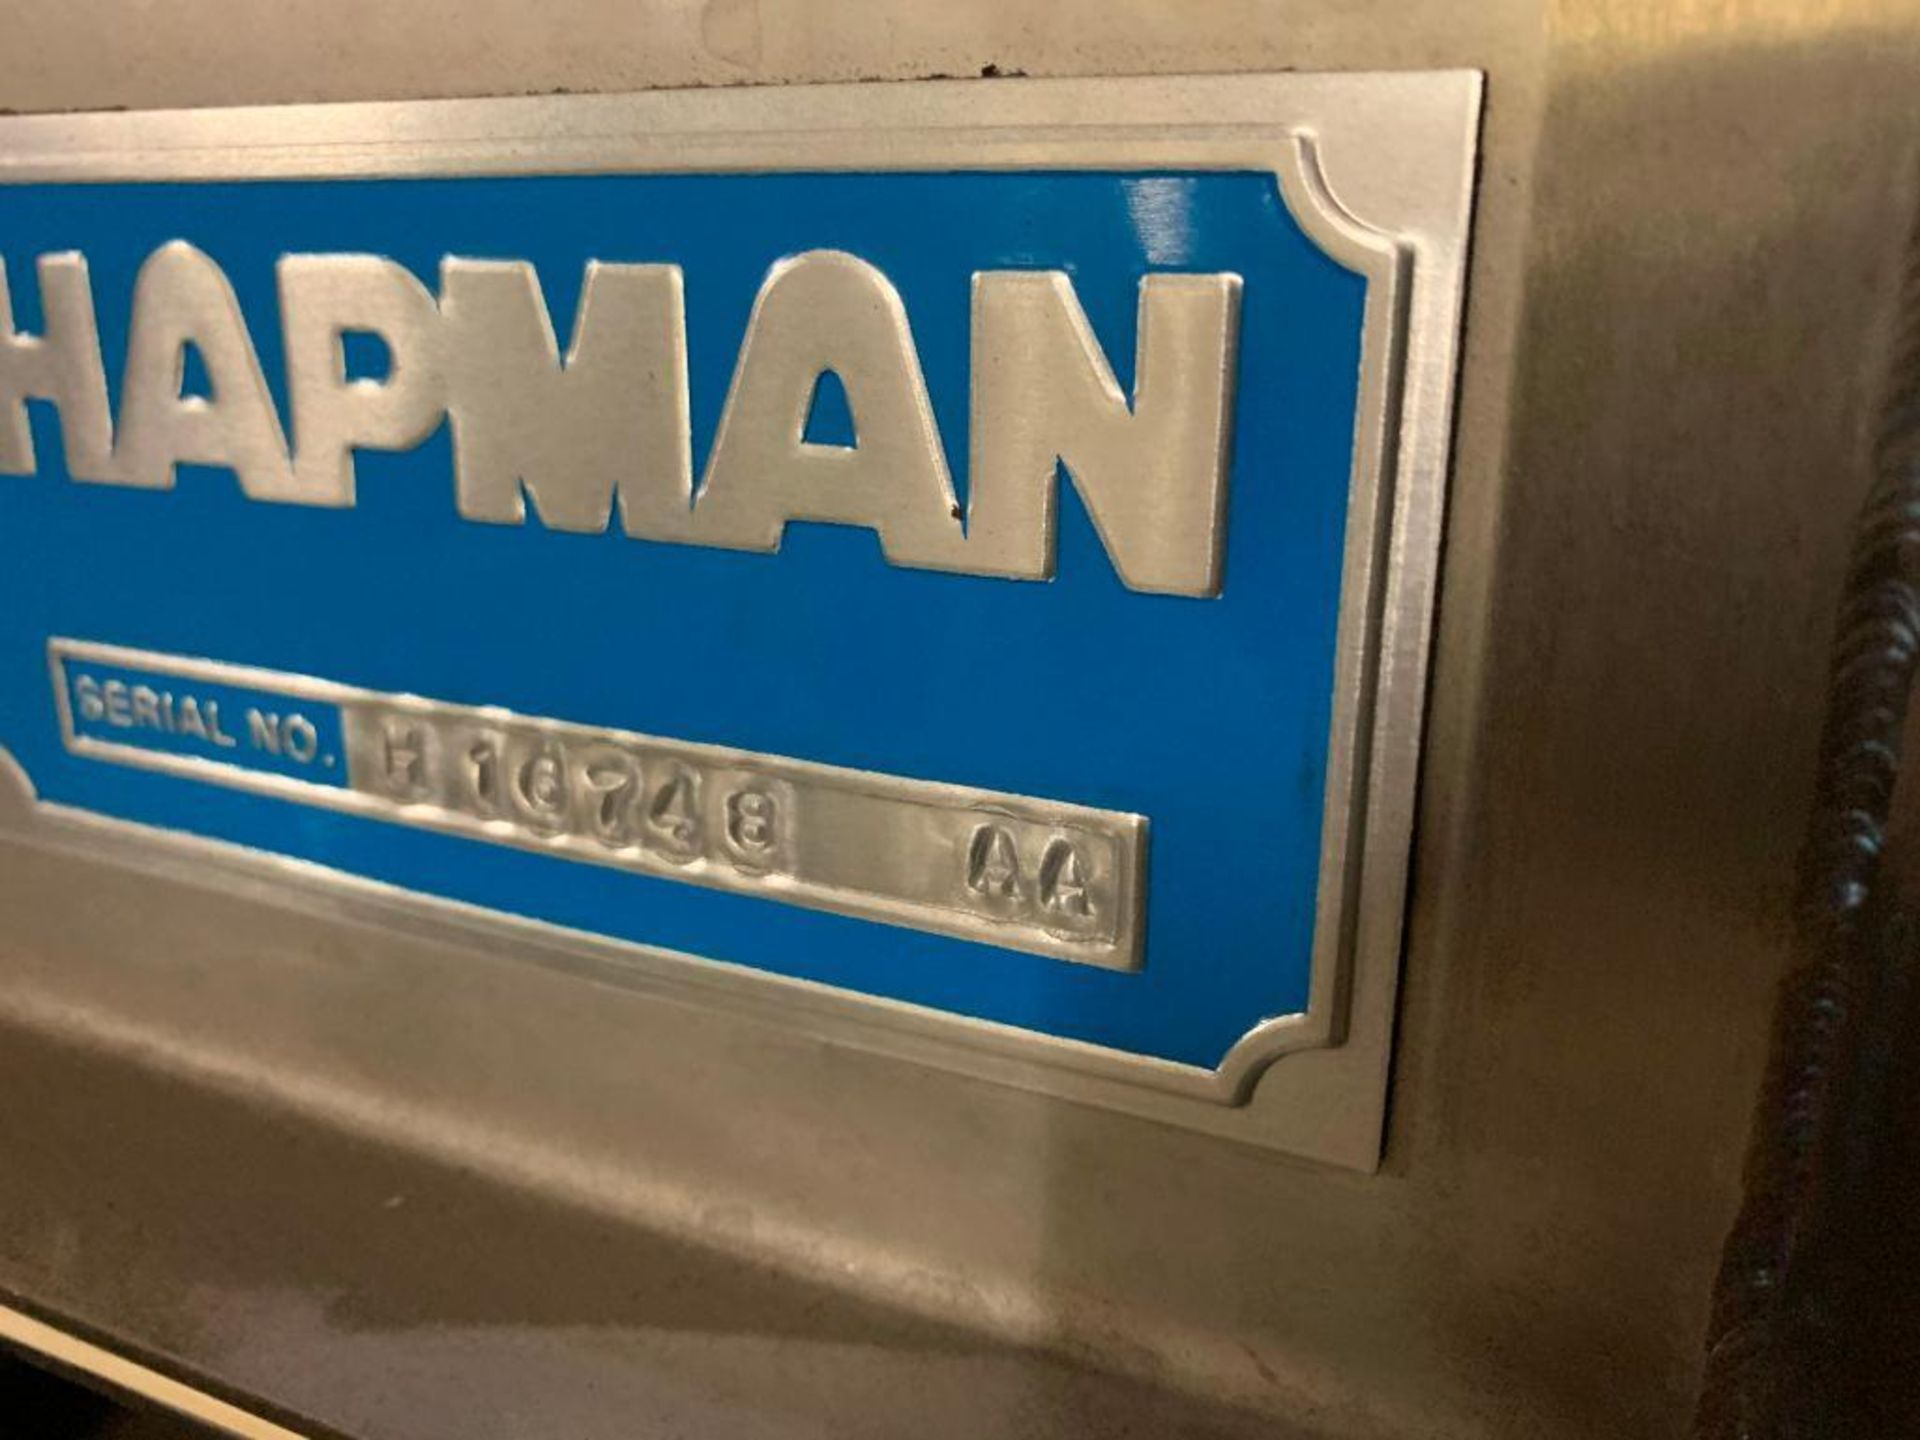 Hapman stainless steel bag dump cabinet - Image 2 of 4